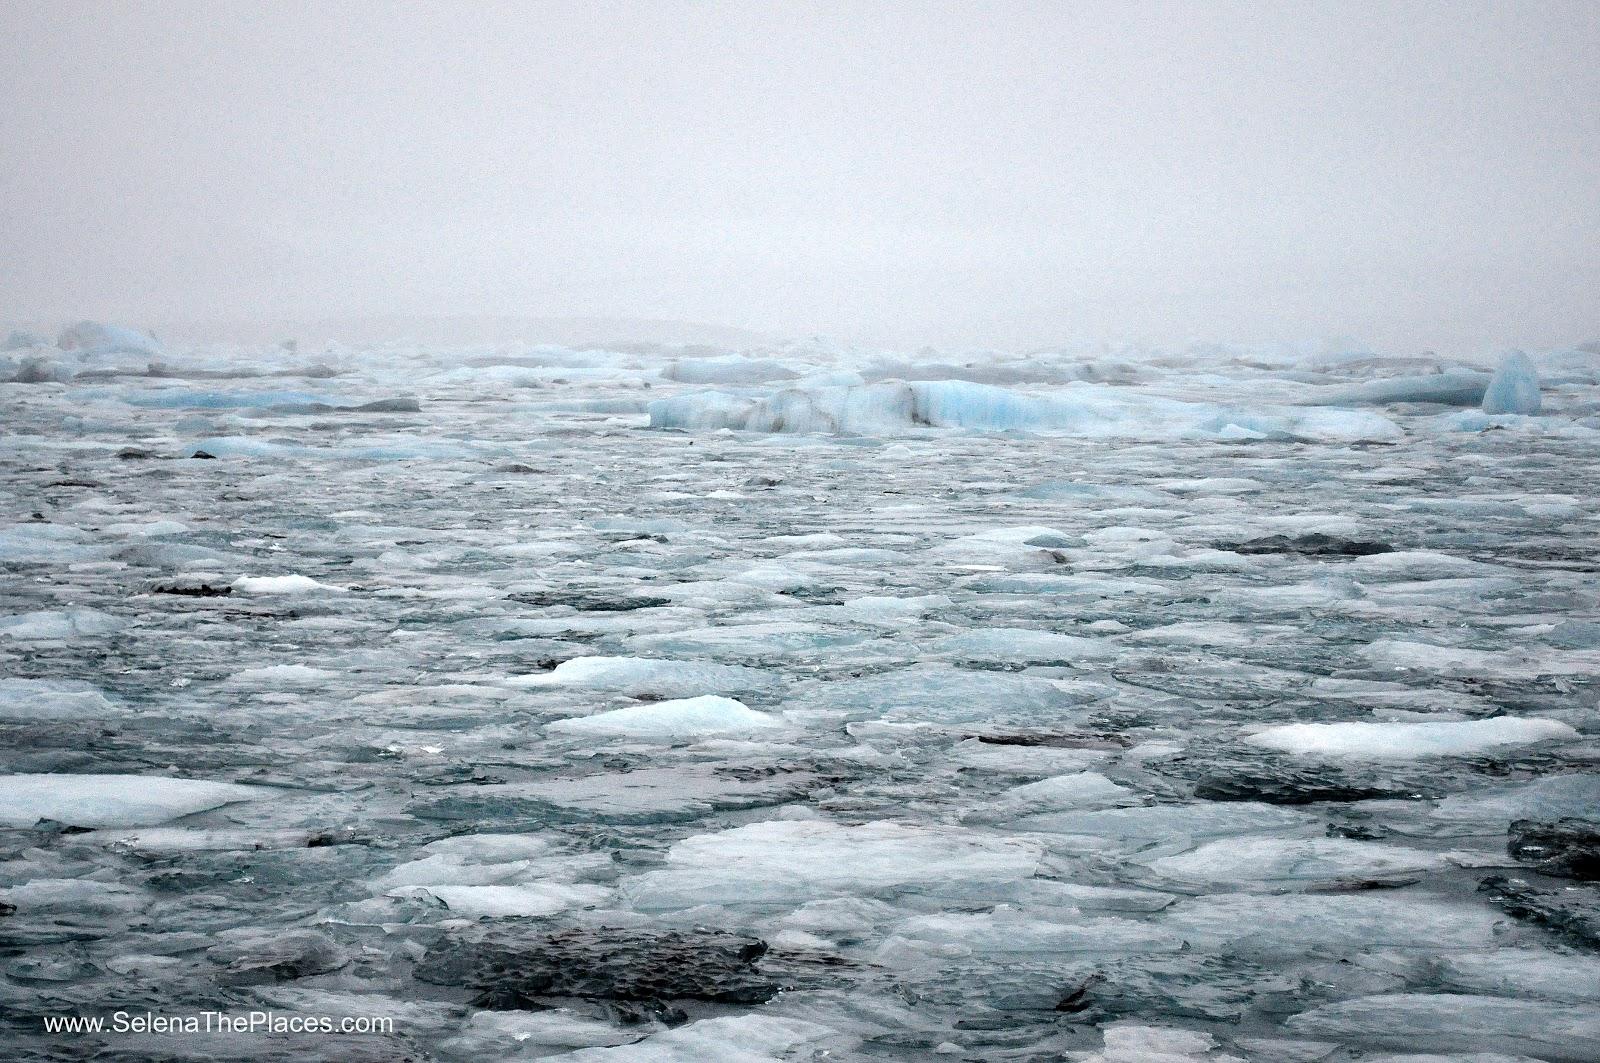 Jokulsarlon - Iceland's Glacier Lagoon